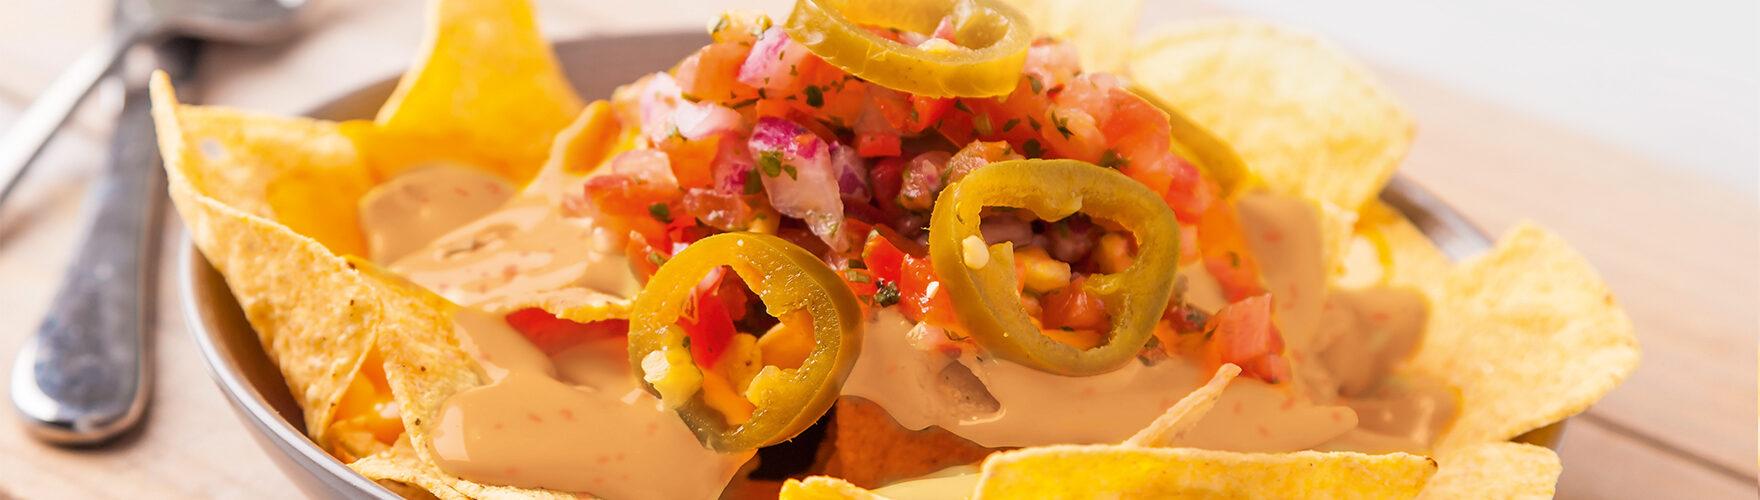 Tortilla nachos met tomaat, ui en sambal